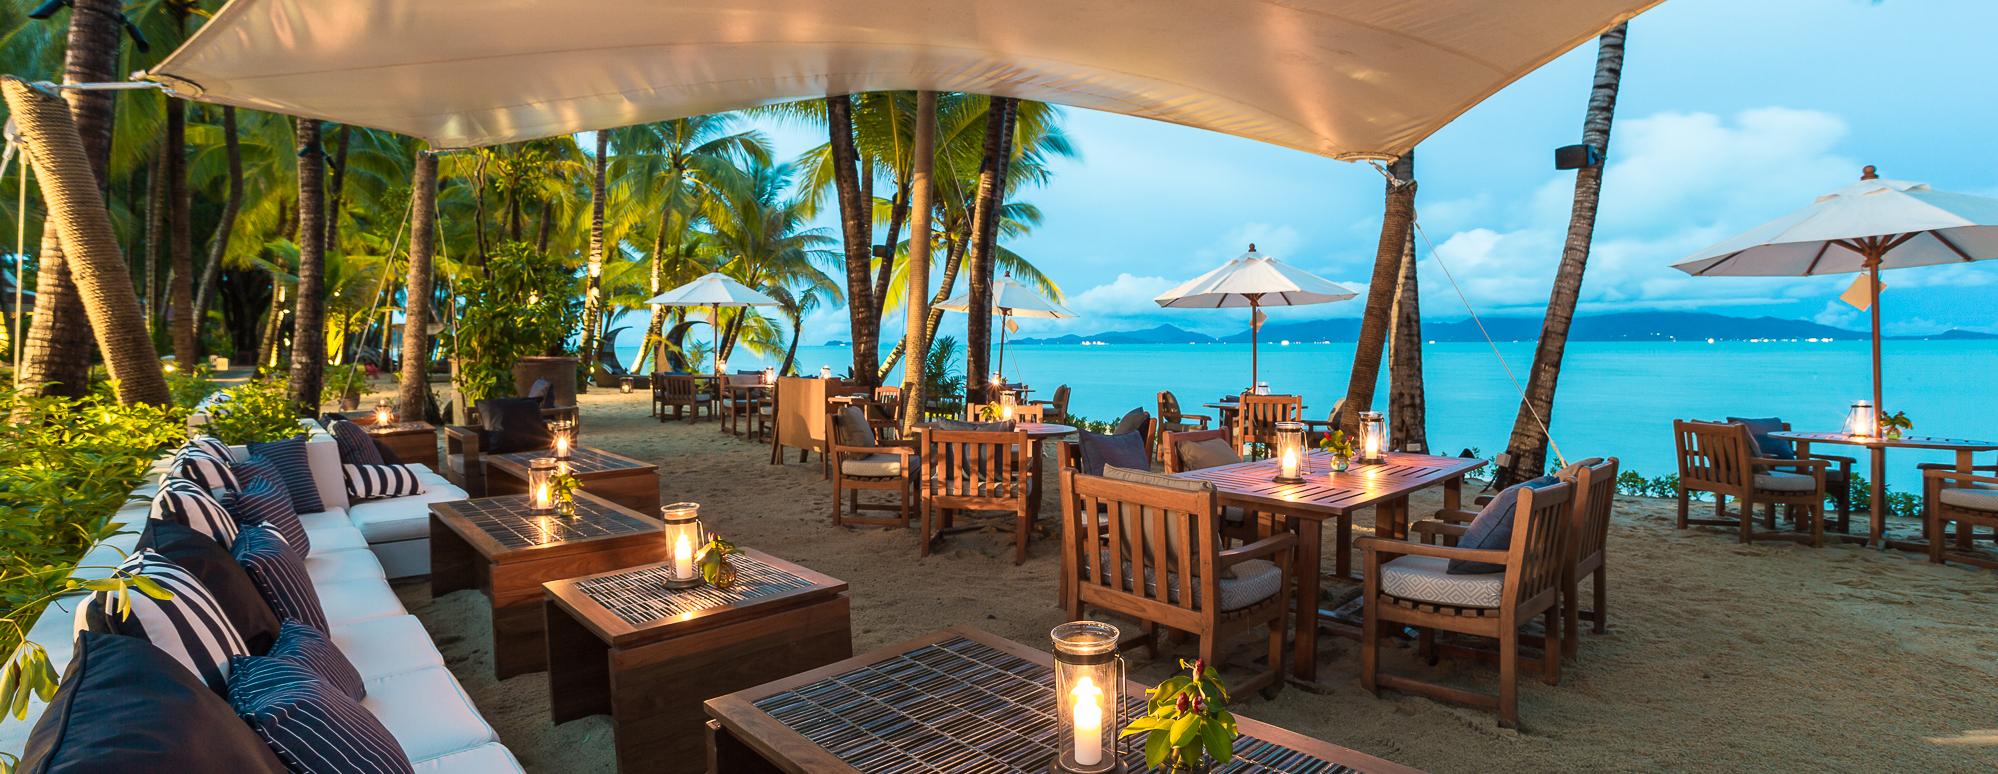 The-Beach-House-santiburi